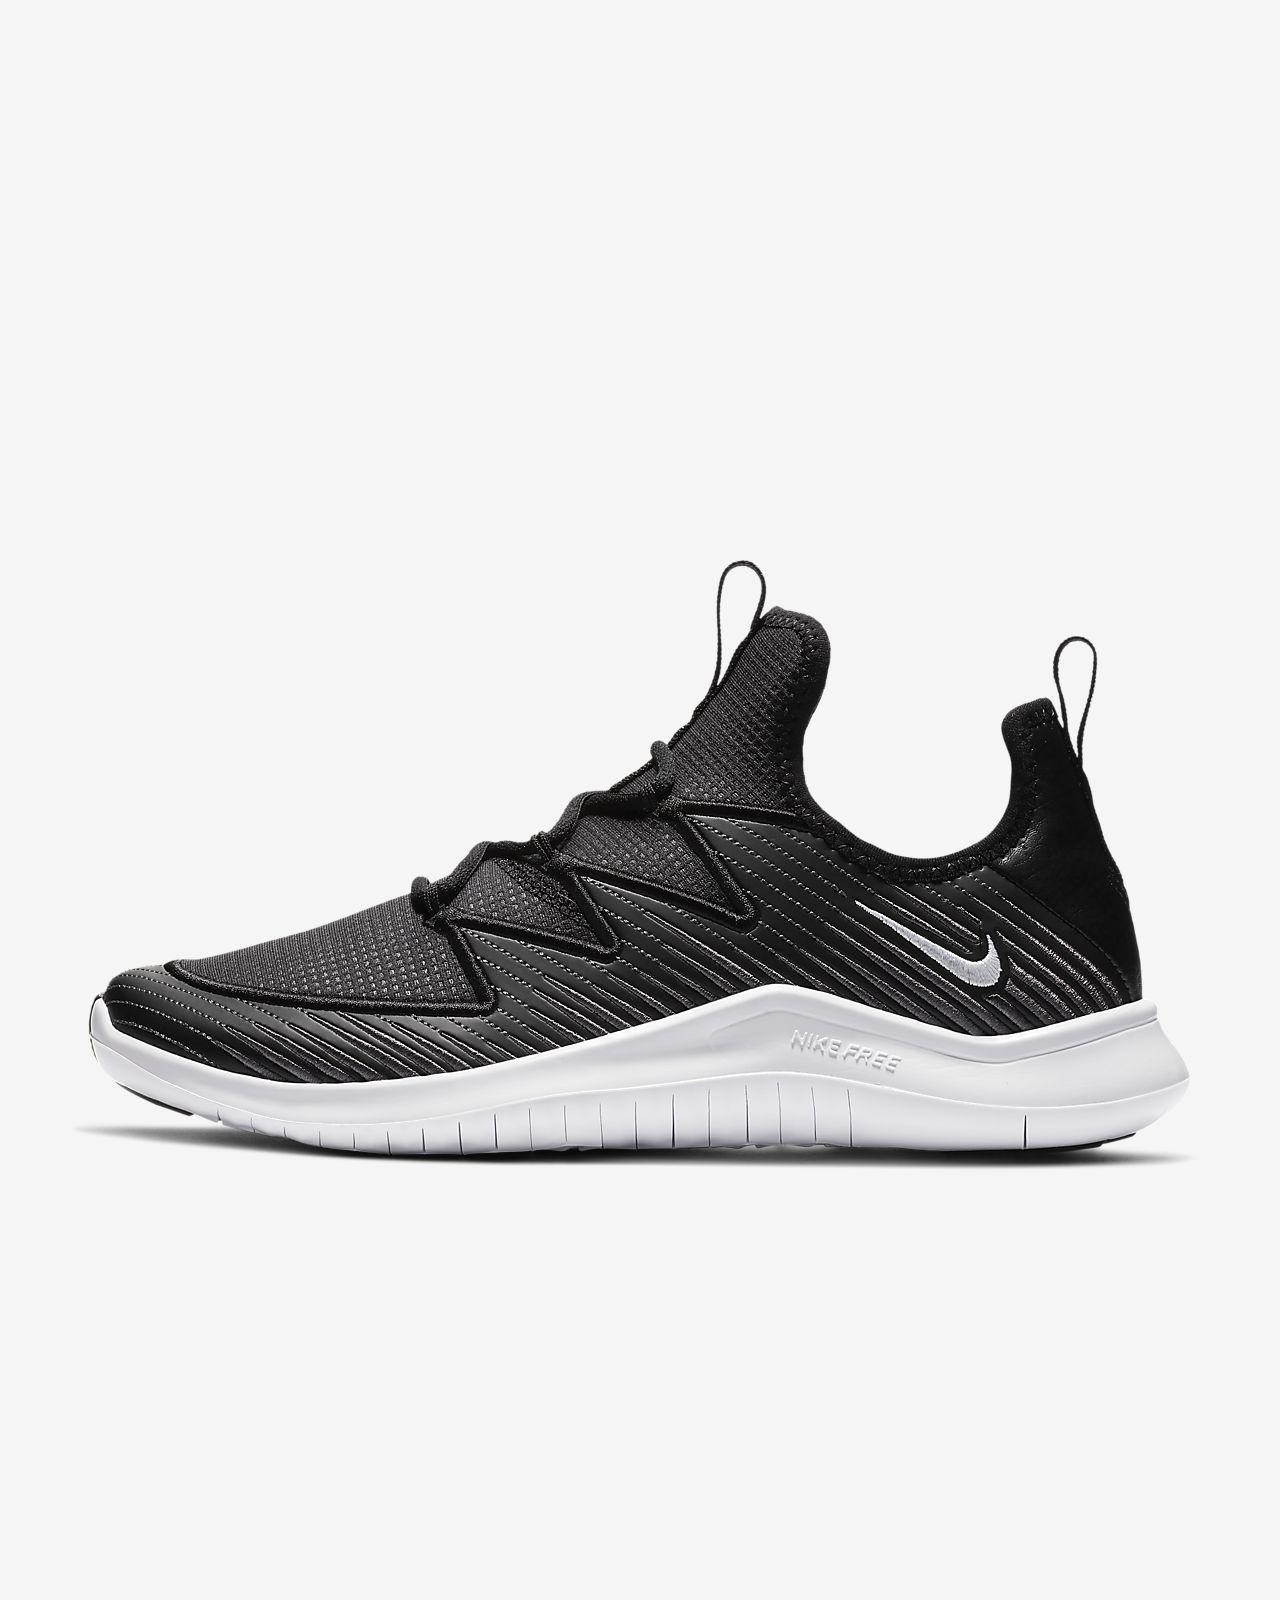 0fe2b730de1 Γυναικείο παπούτσι προπόνησης Nike Free TR Ultra. Nike.com GR